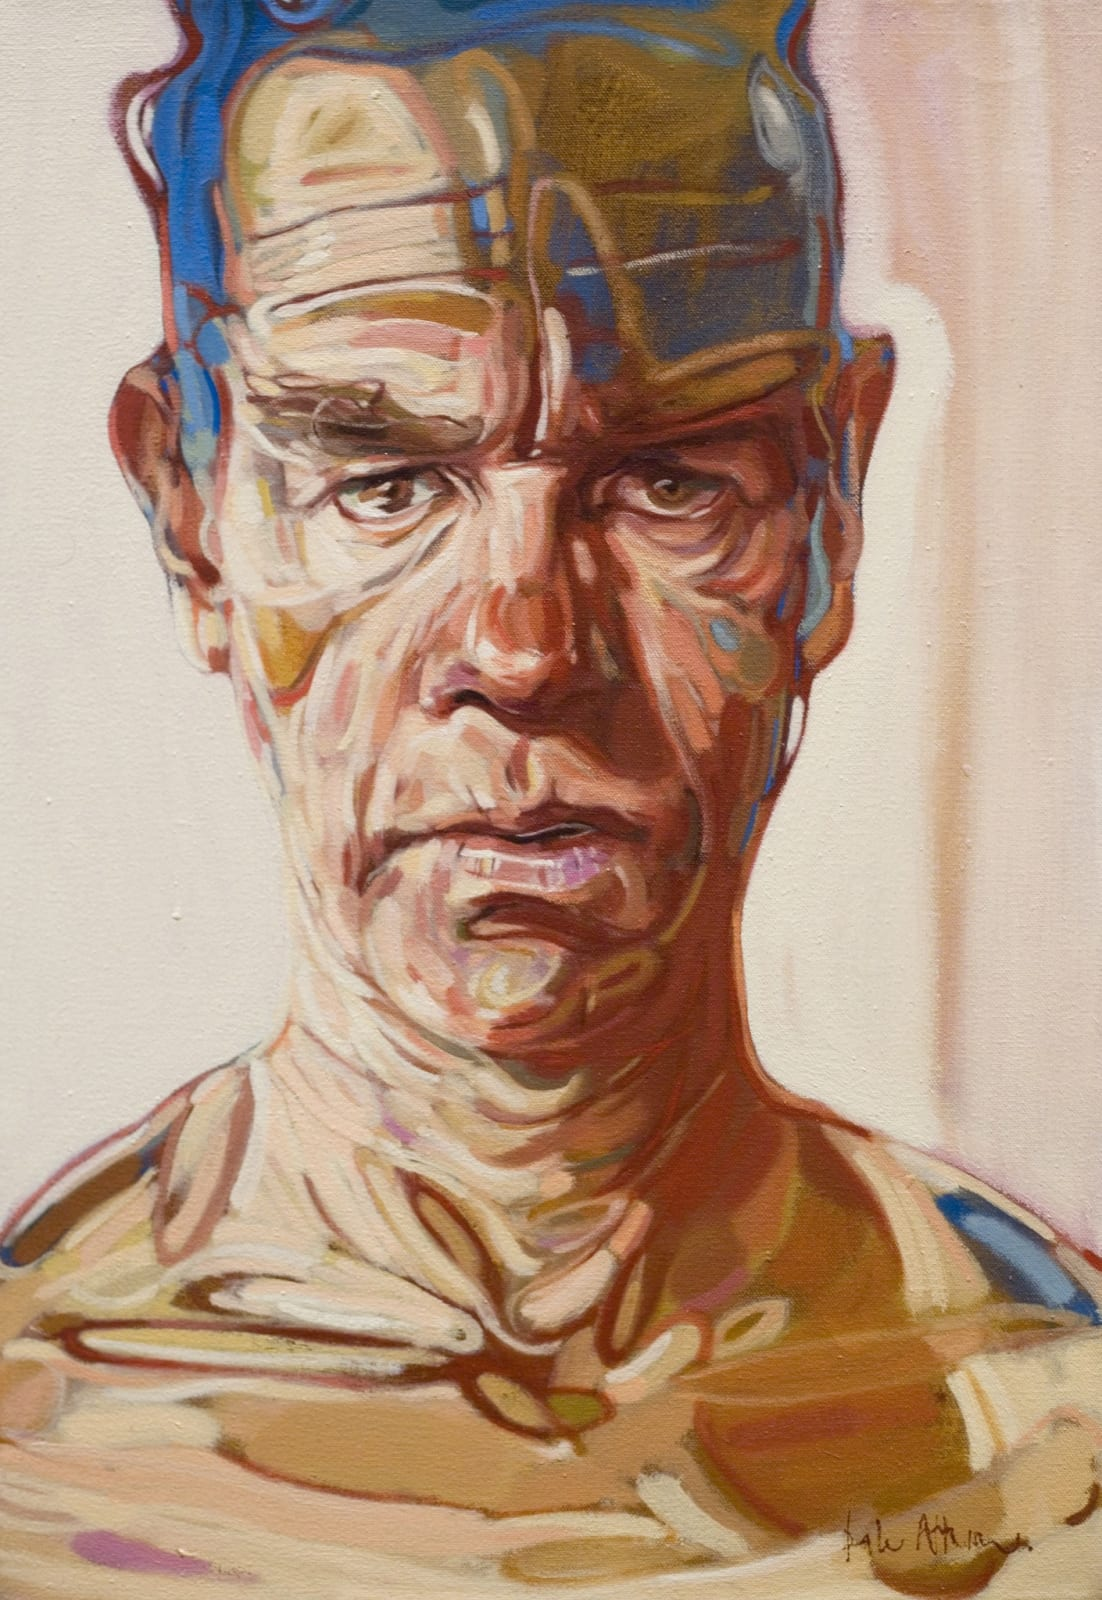 Dale Atkinson, Self-Portrait, 2013